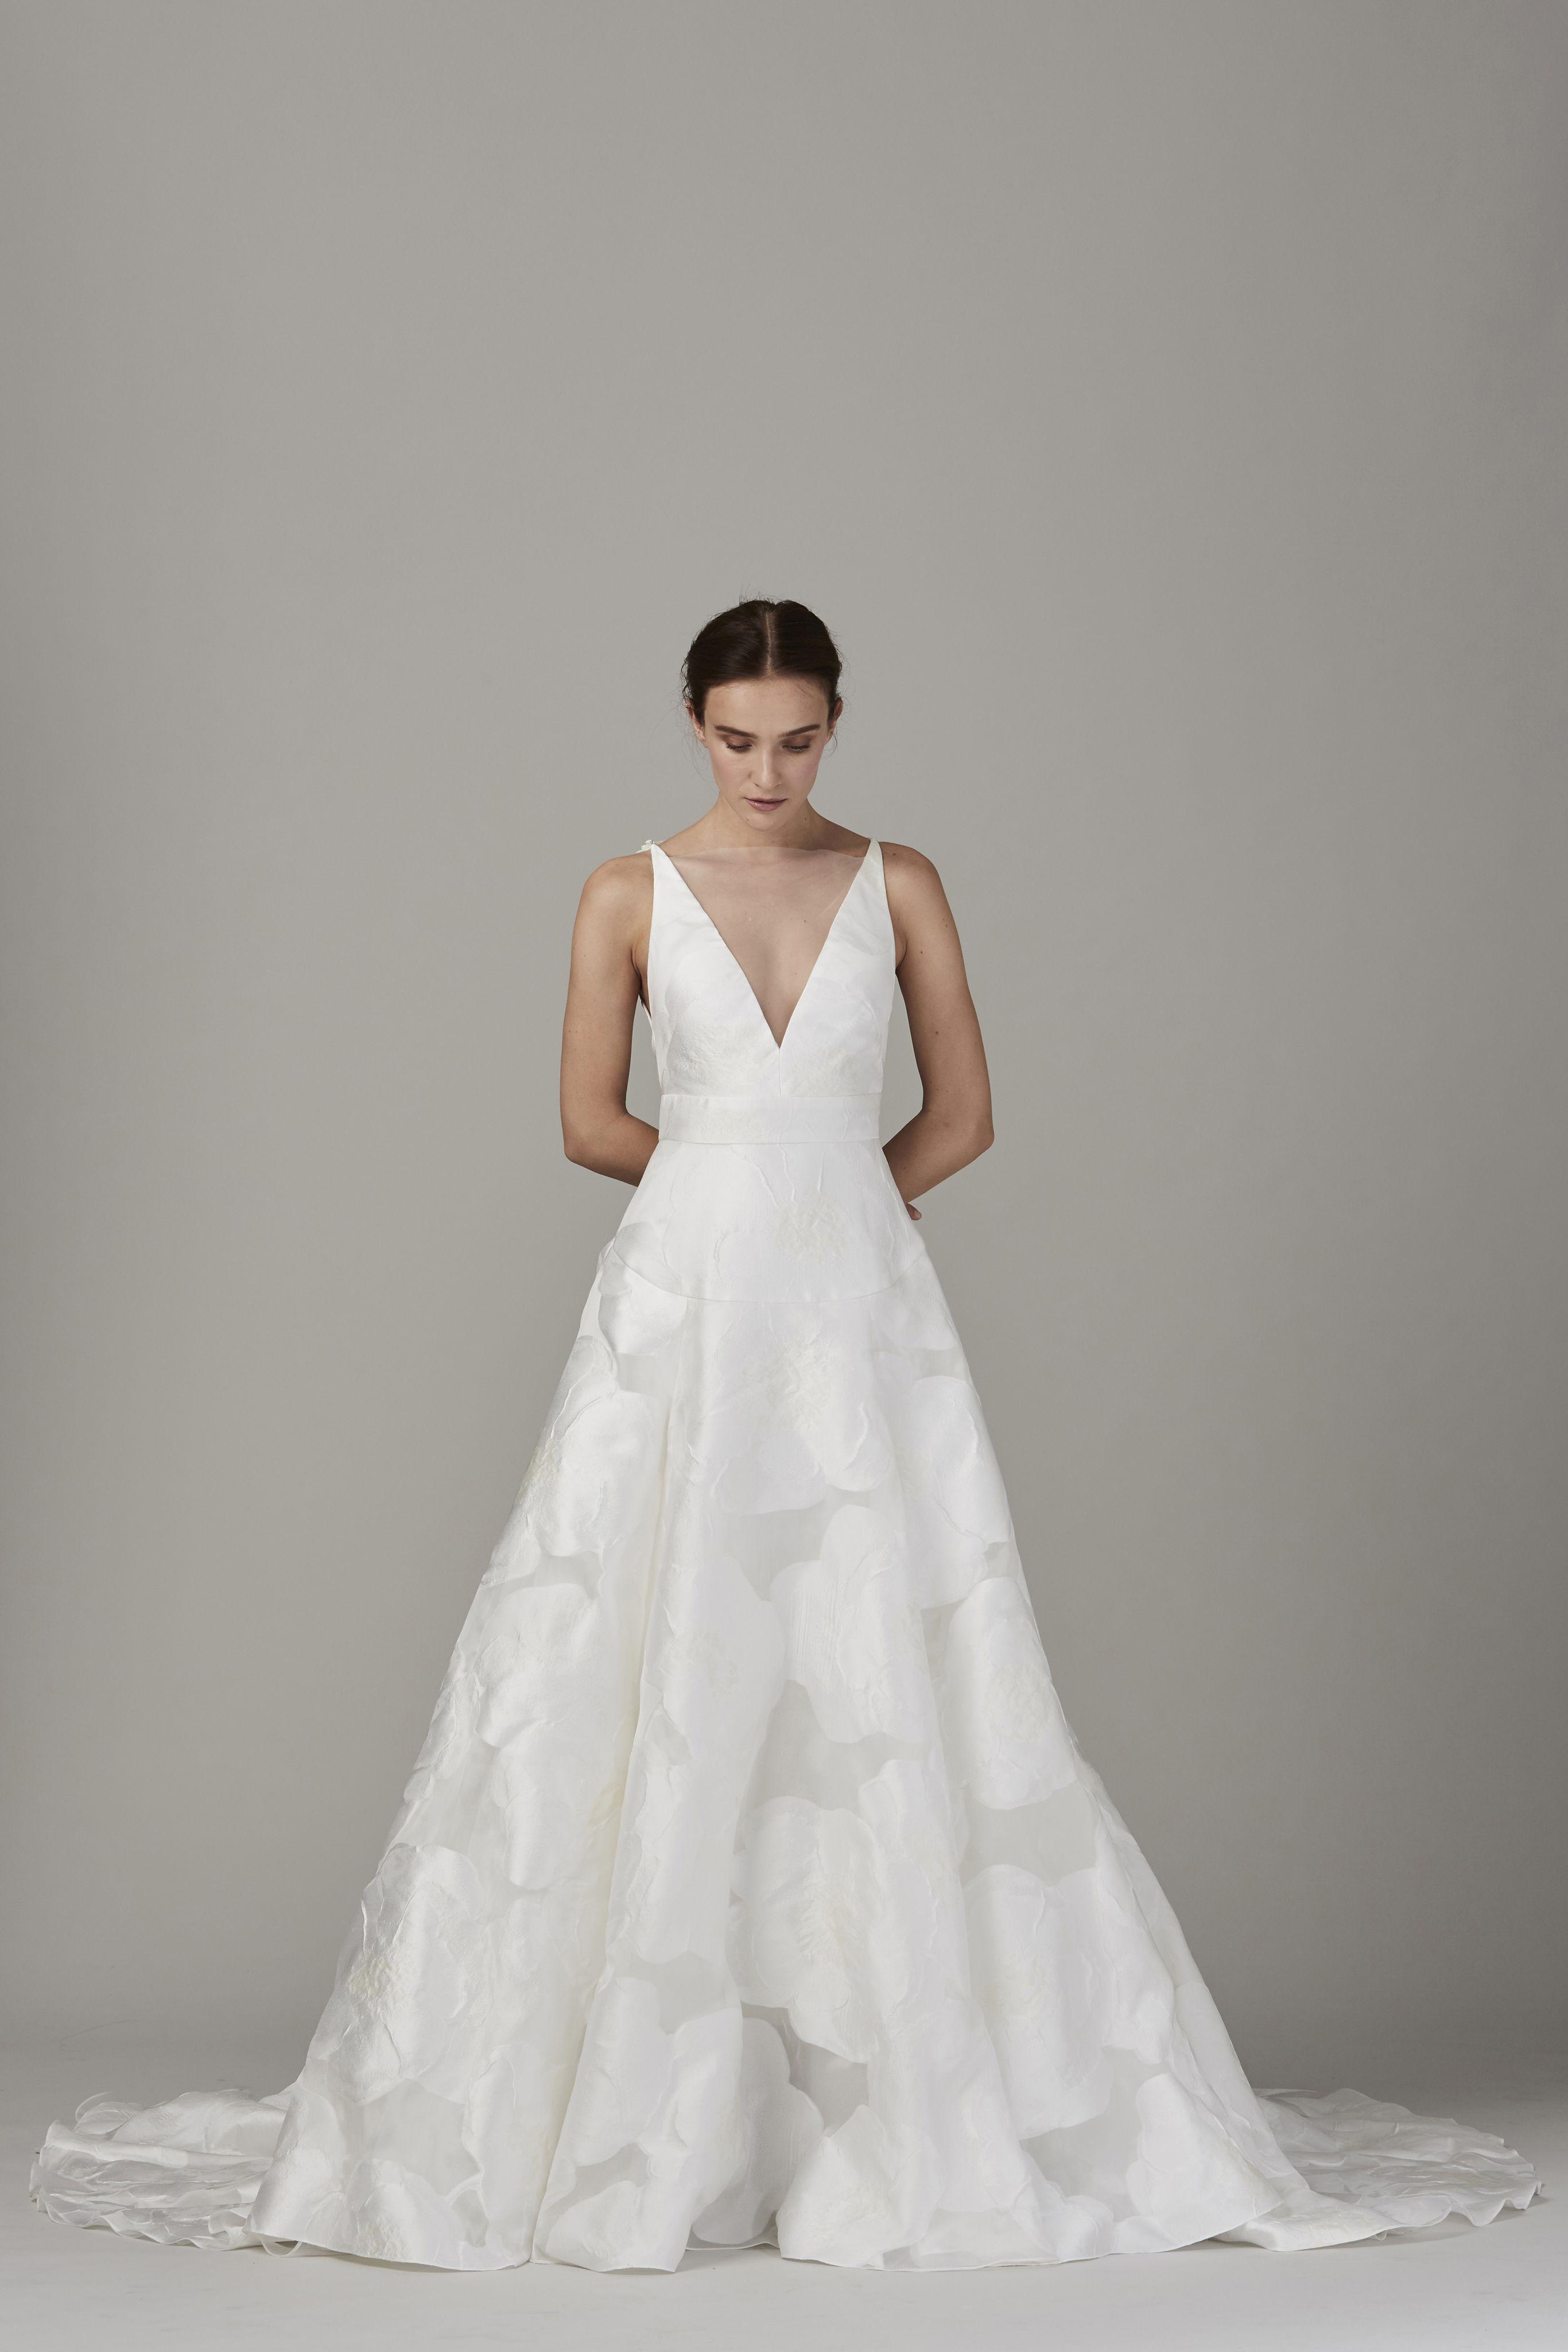 V Neck Textured Ballgown Wedding Dress Fall Winter 2017 Lela Rose